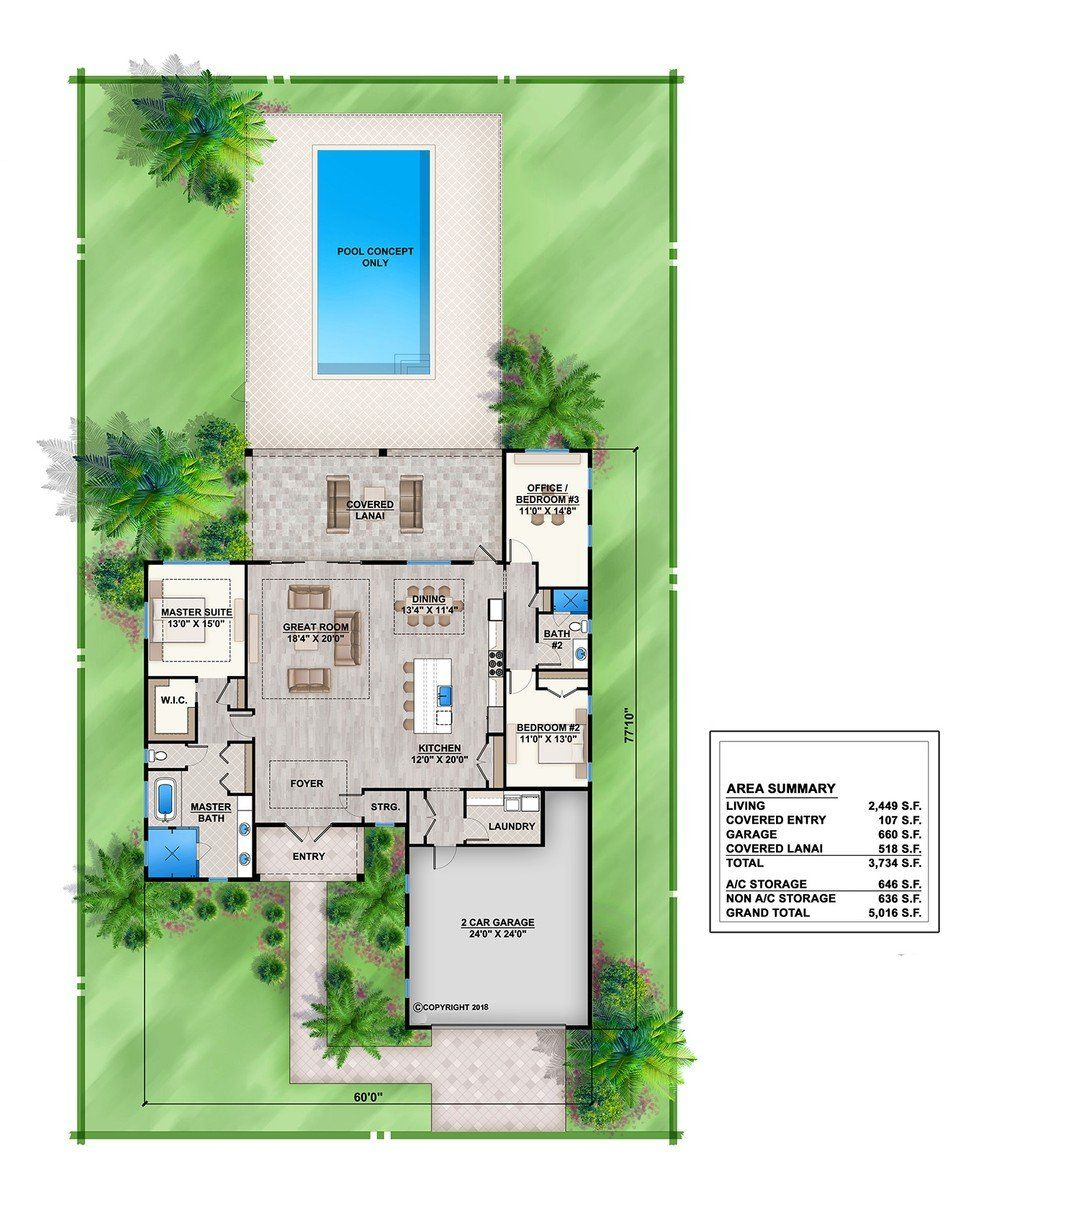 Pin By Gerri Hixenbaugh On House Ideas Florida House Plans House Plans Mediterranean Style House Plans